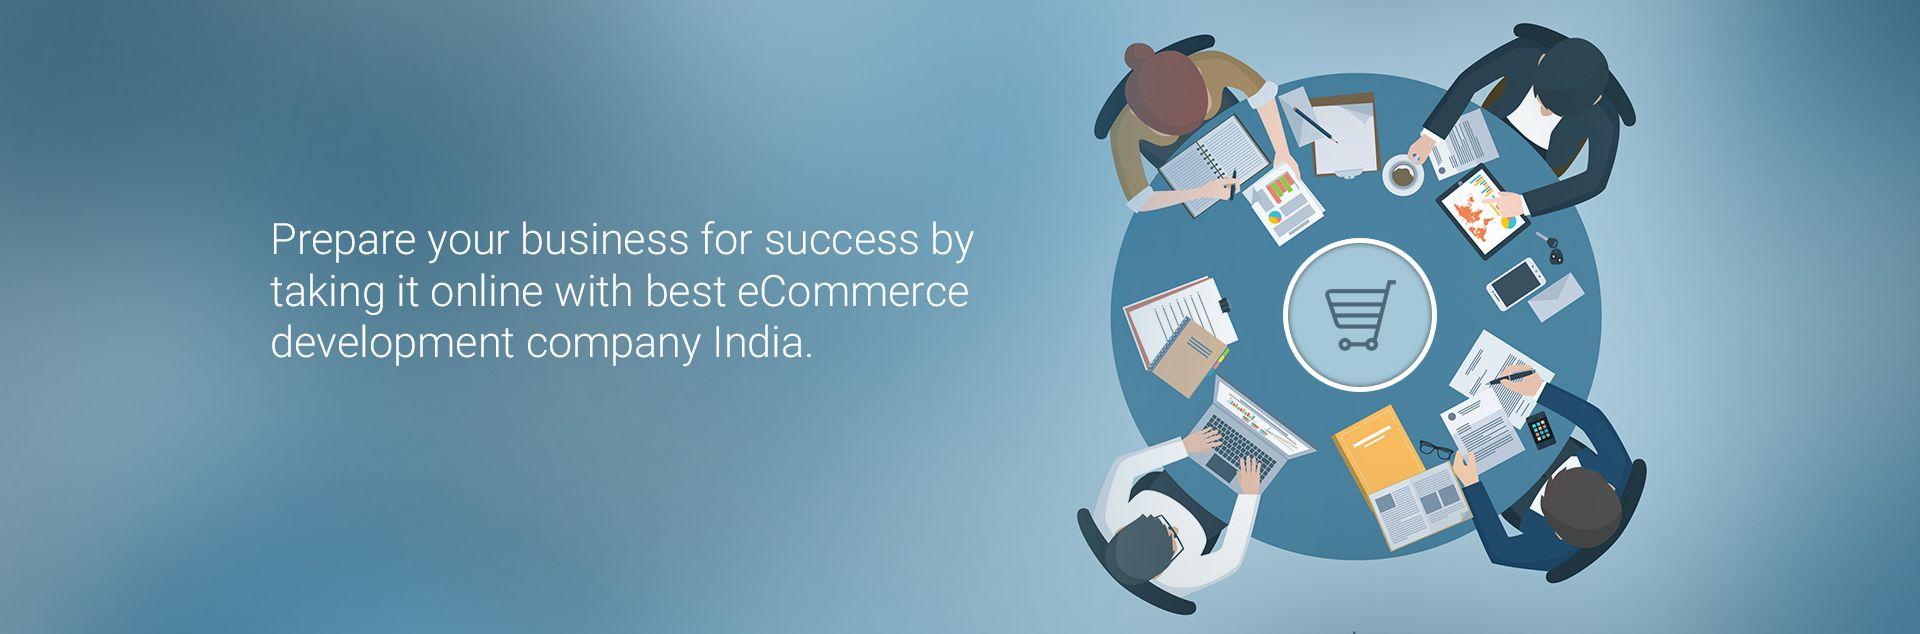 Best Ecommerce Development Company India